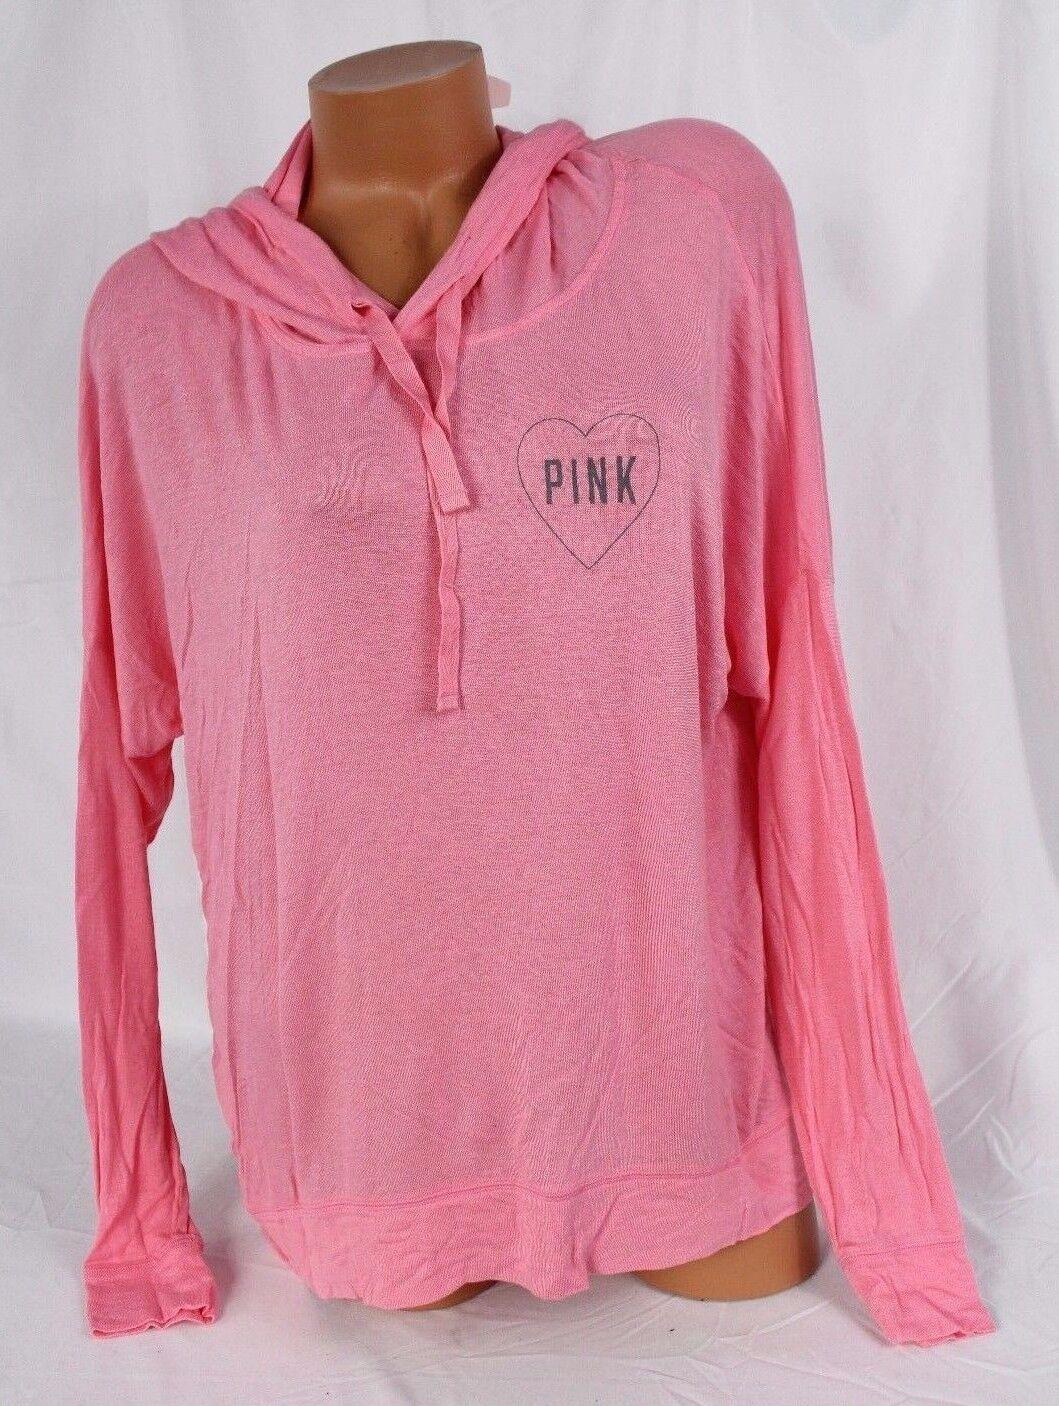 Victoria's Secret PINK sz S soft, stretchy oversized lightweight Hoodie, heart